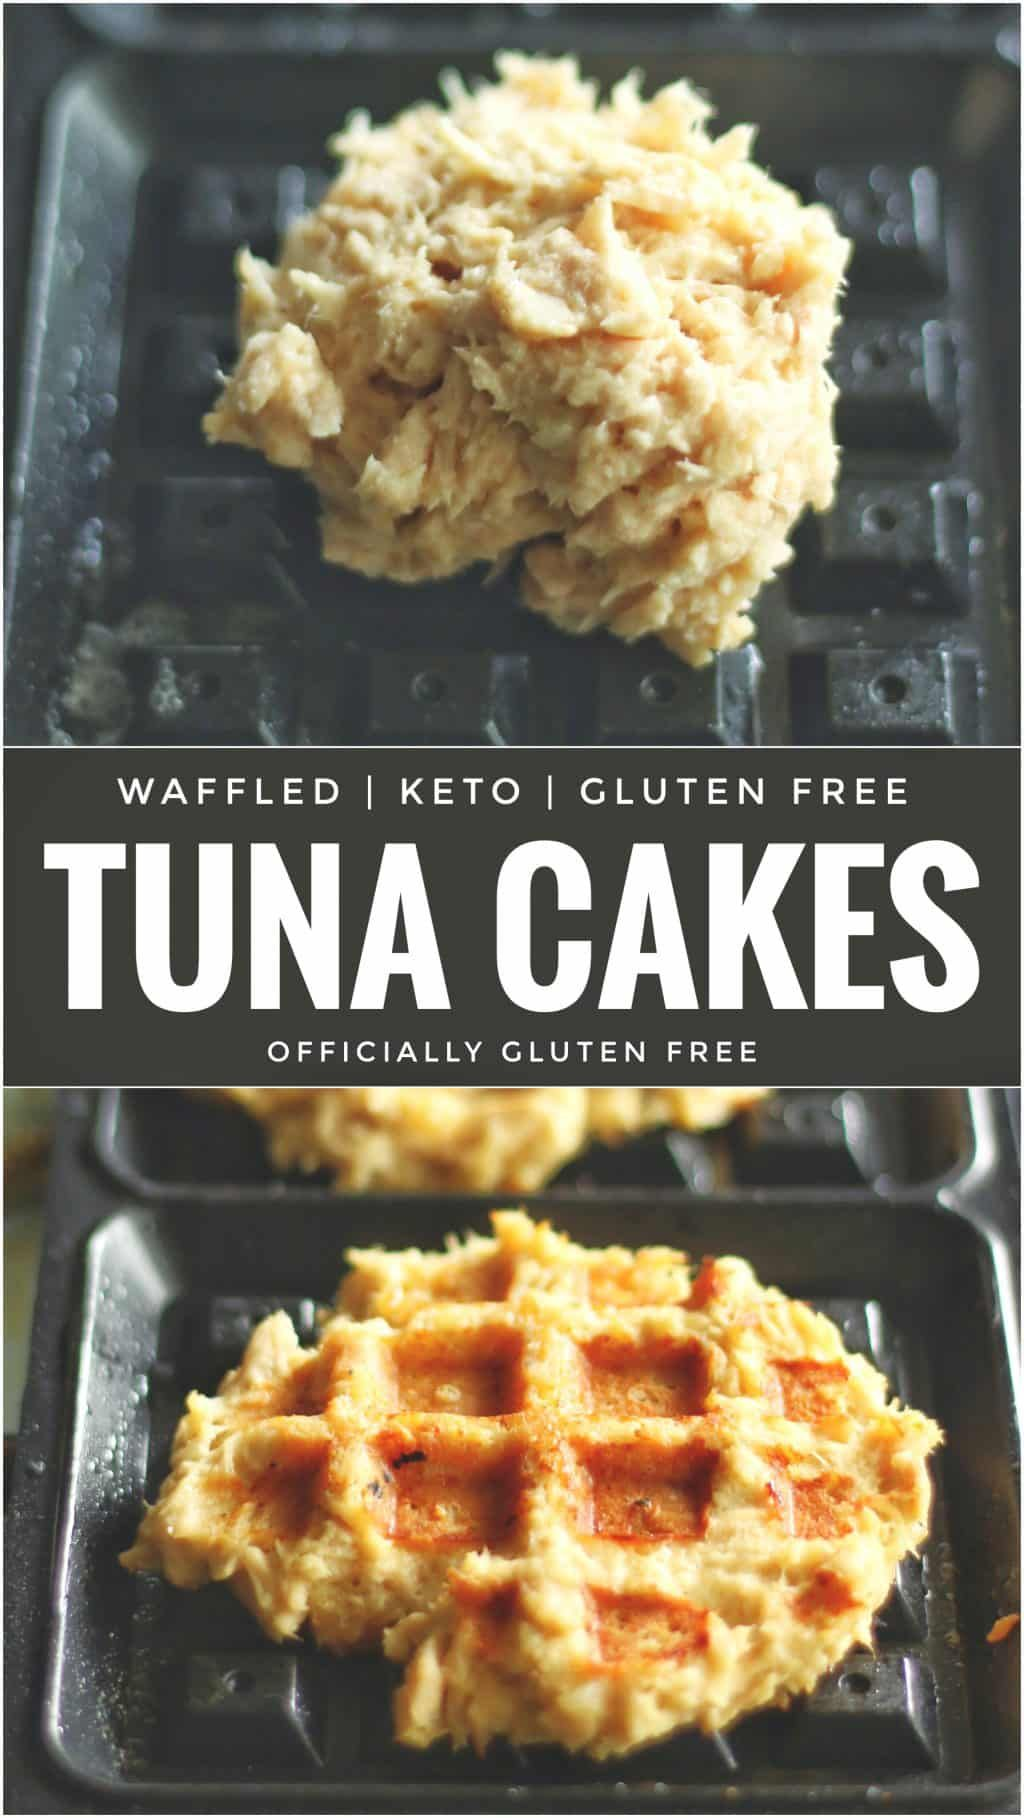 Photo of Low Carb Waffled Tuna Cakes | Keto & Gluten Free Waffled Tuna Patties